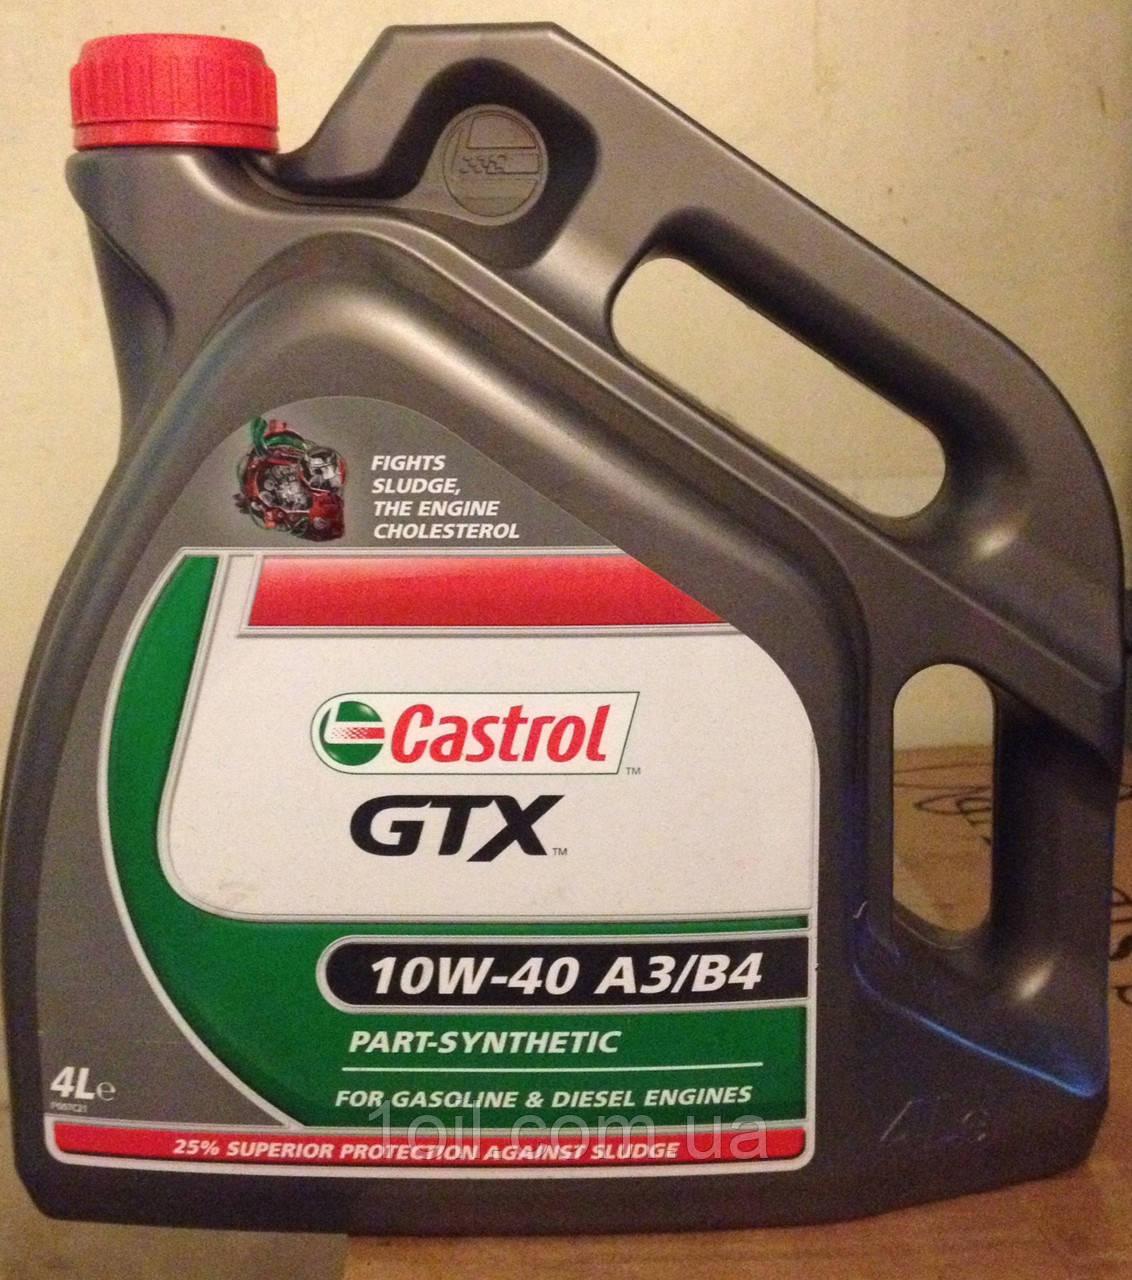 Олива моторна Castrol GTX 10W-40 A3/B4 4L (з ліцензії)